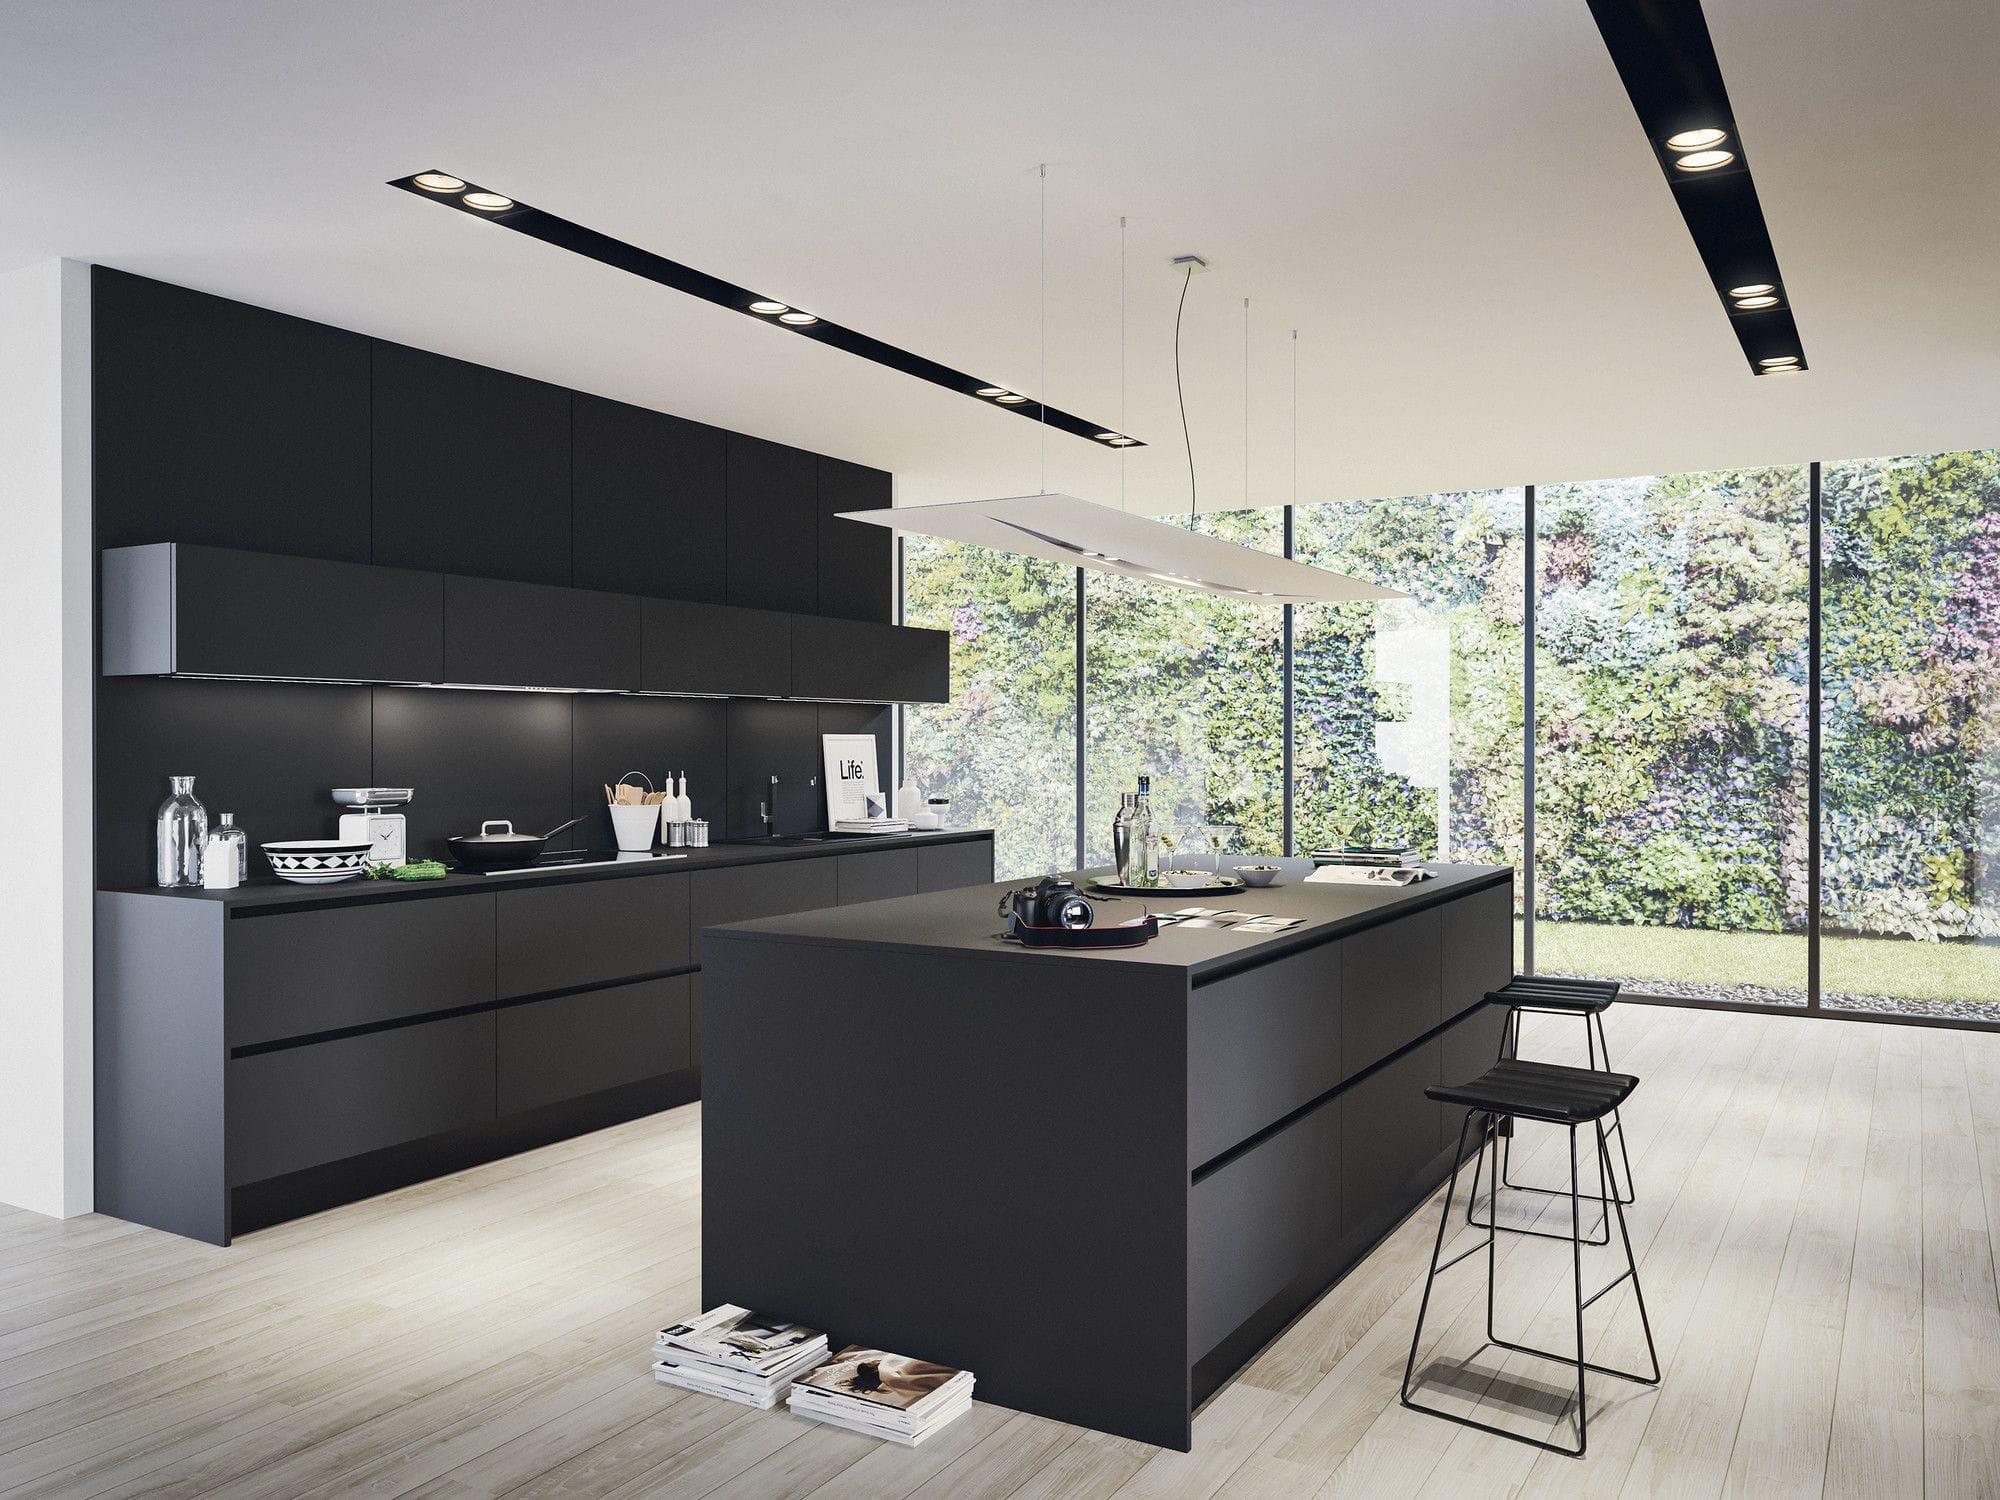 Moderne Küche / Laminat / Kochinsel / matt - LAMINA 1.0 - Record Cucine